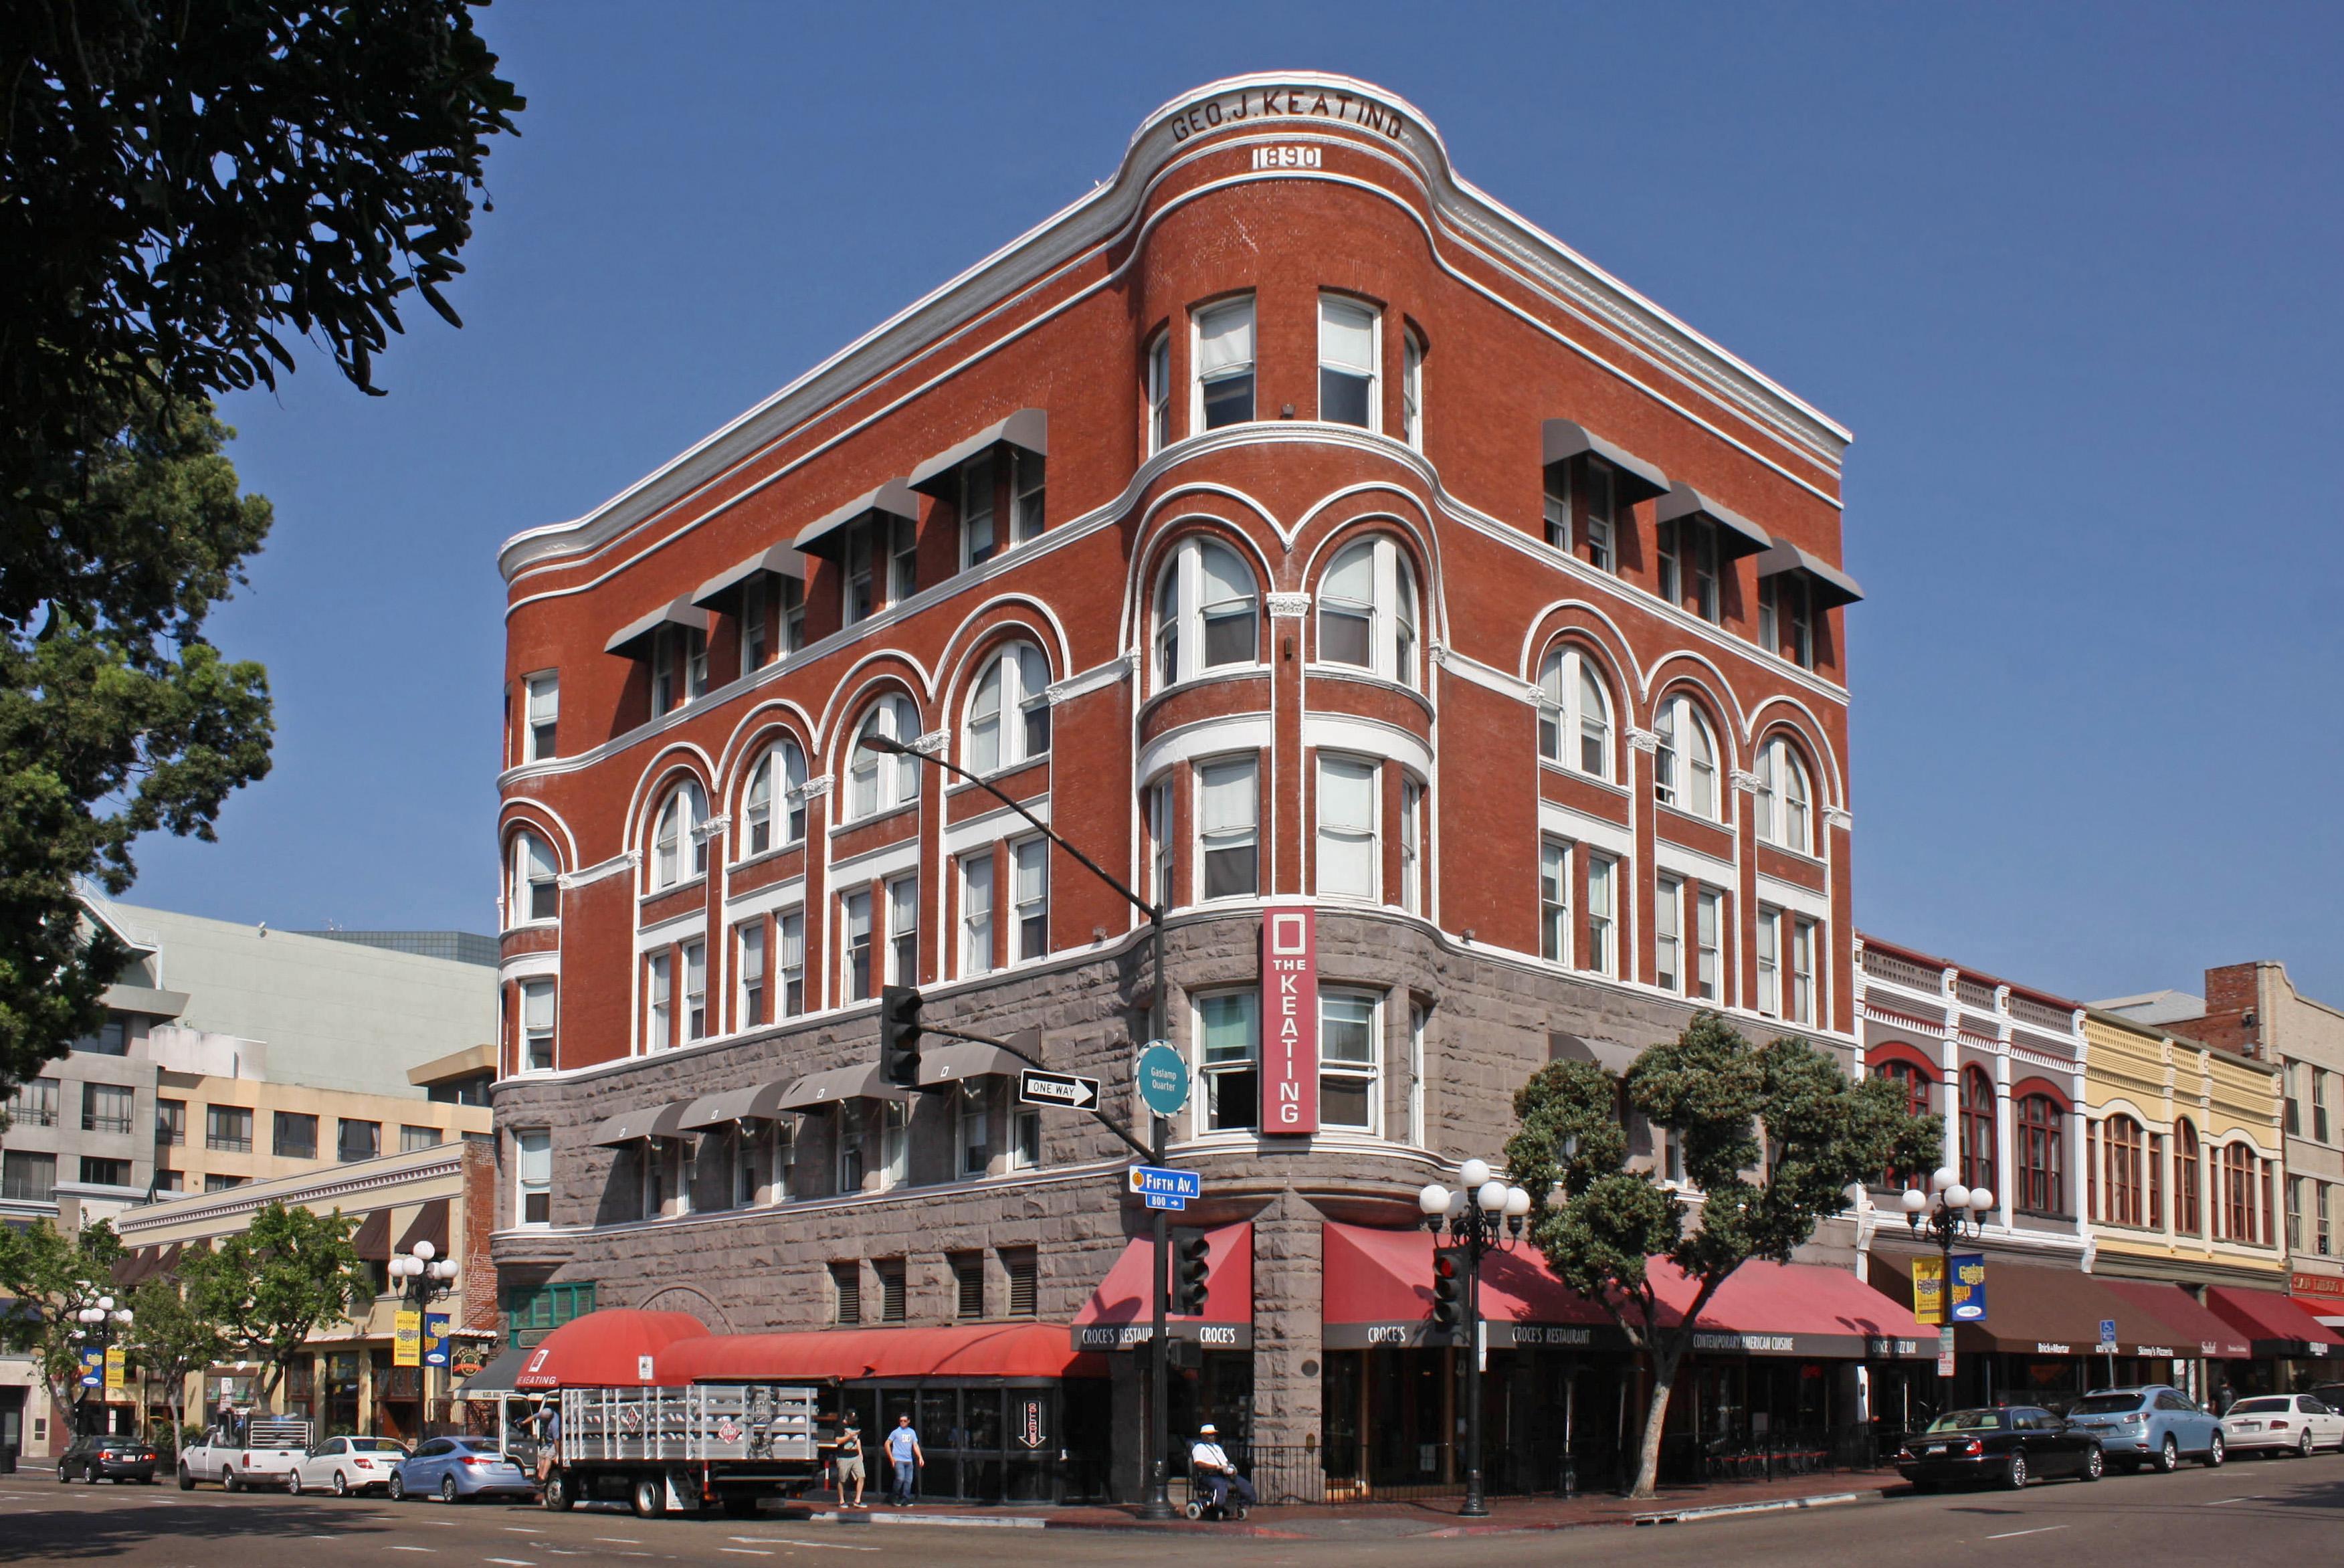 The Keating Hotel San Diego